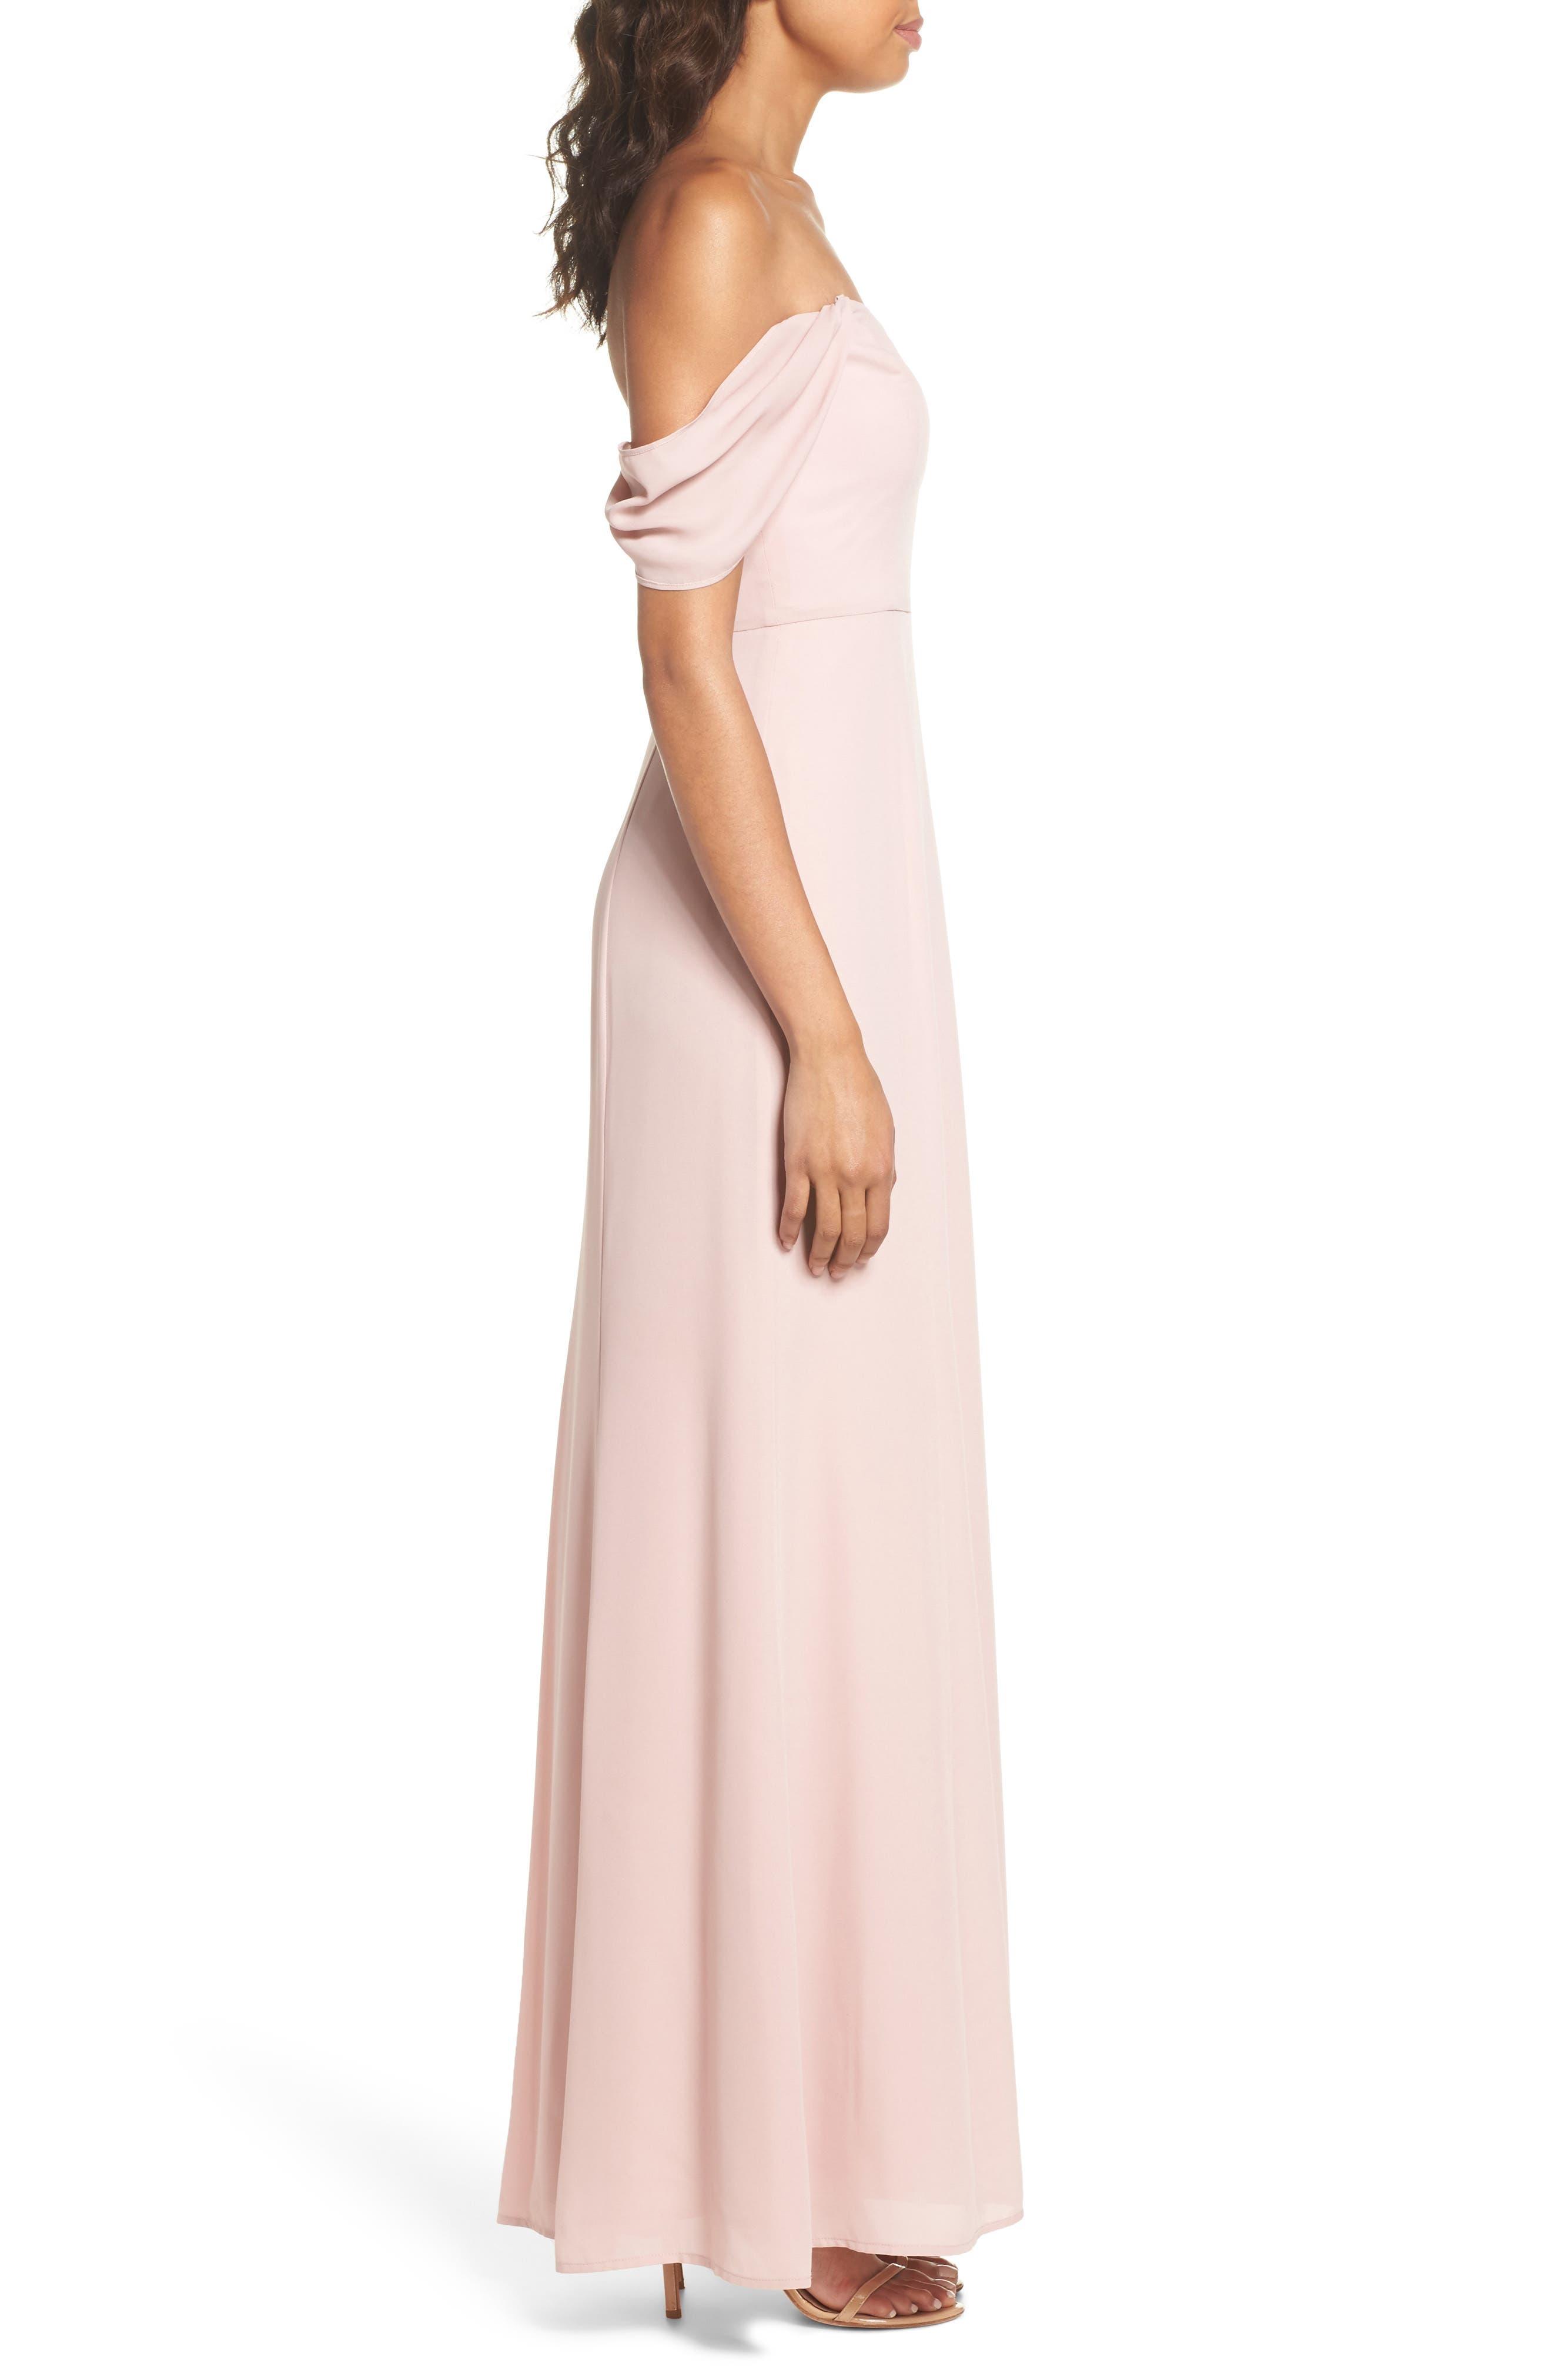 Rachel Off the Shoulder Gored Maxi Dress,                             Alternate thumbnail 9, color,